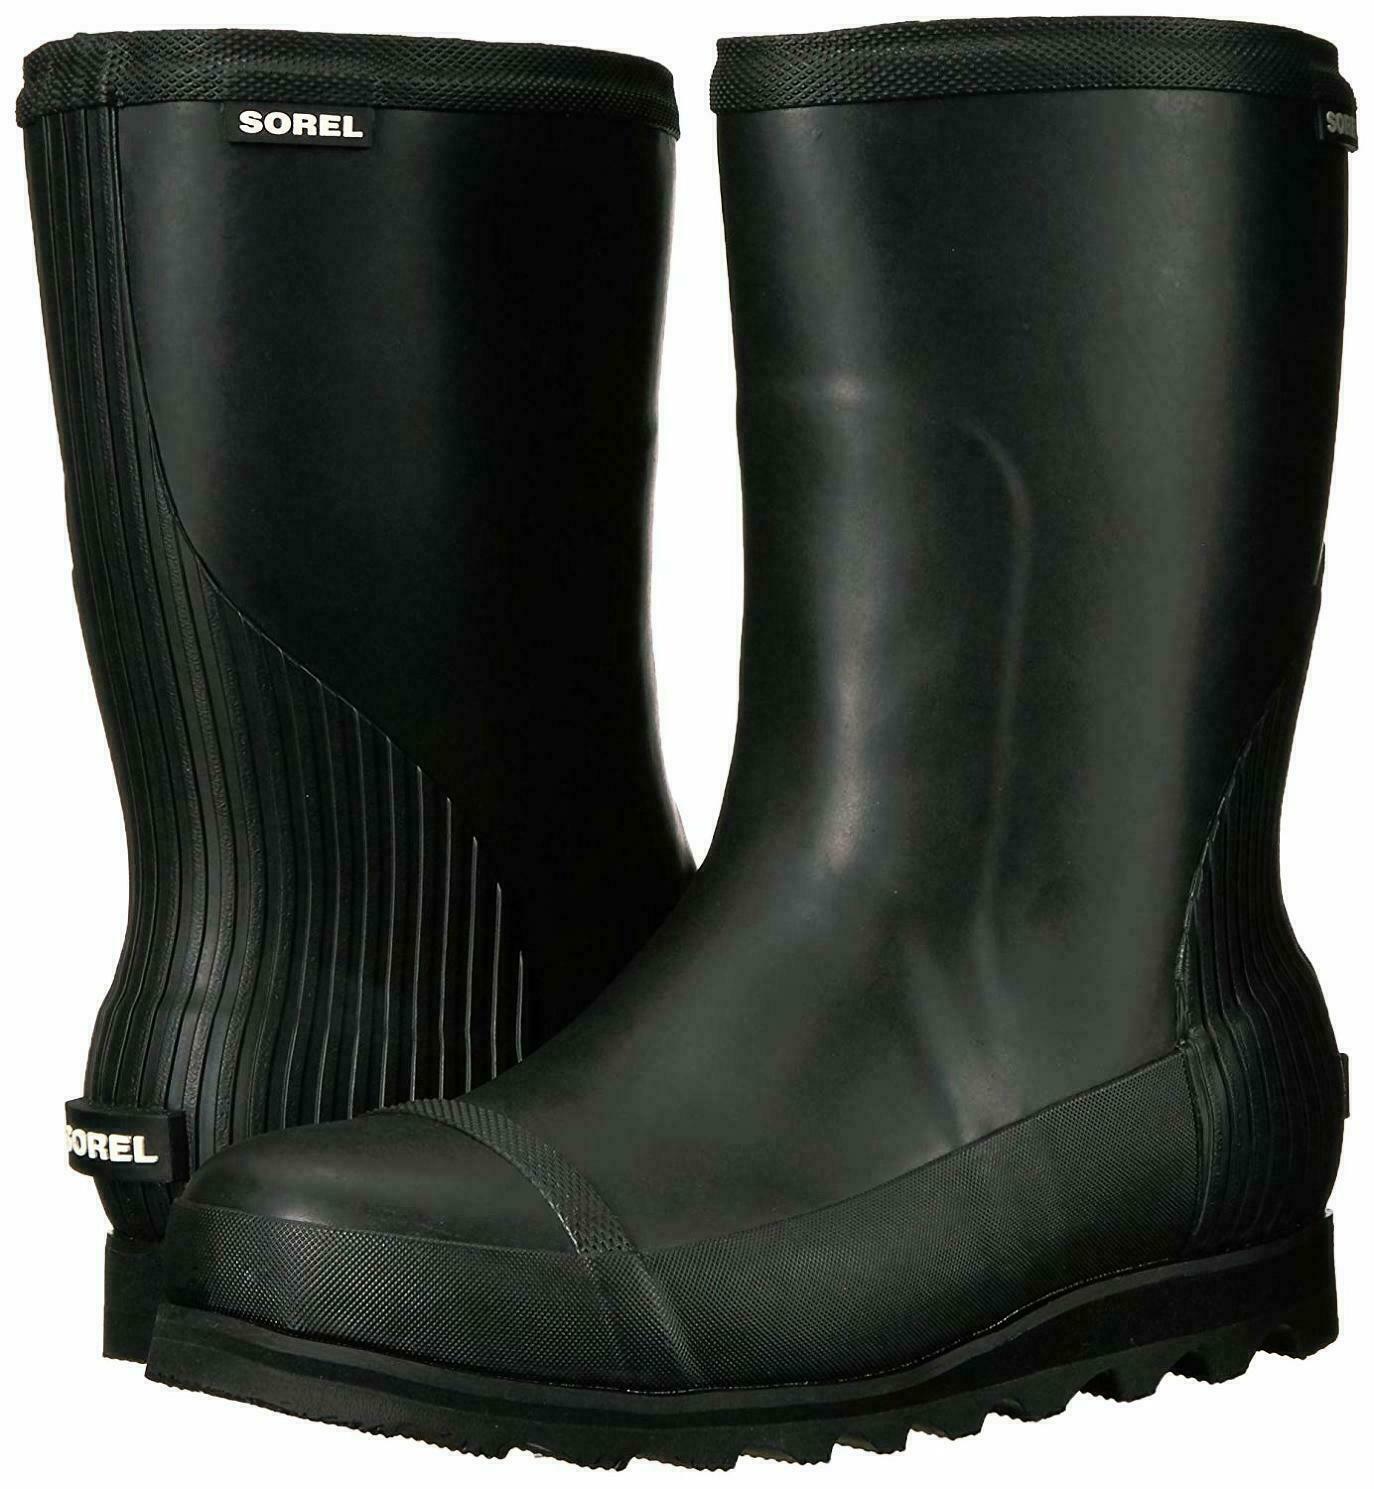 Sorel Joan Rain Short Boots - Women's